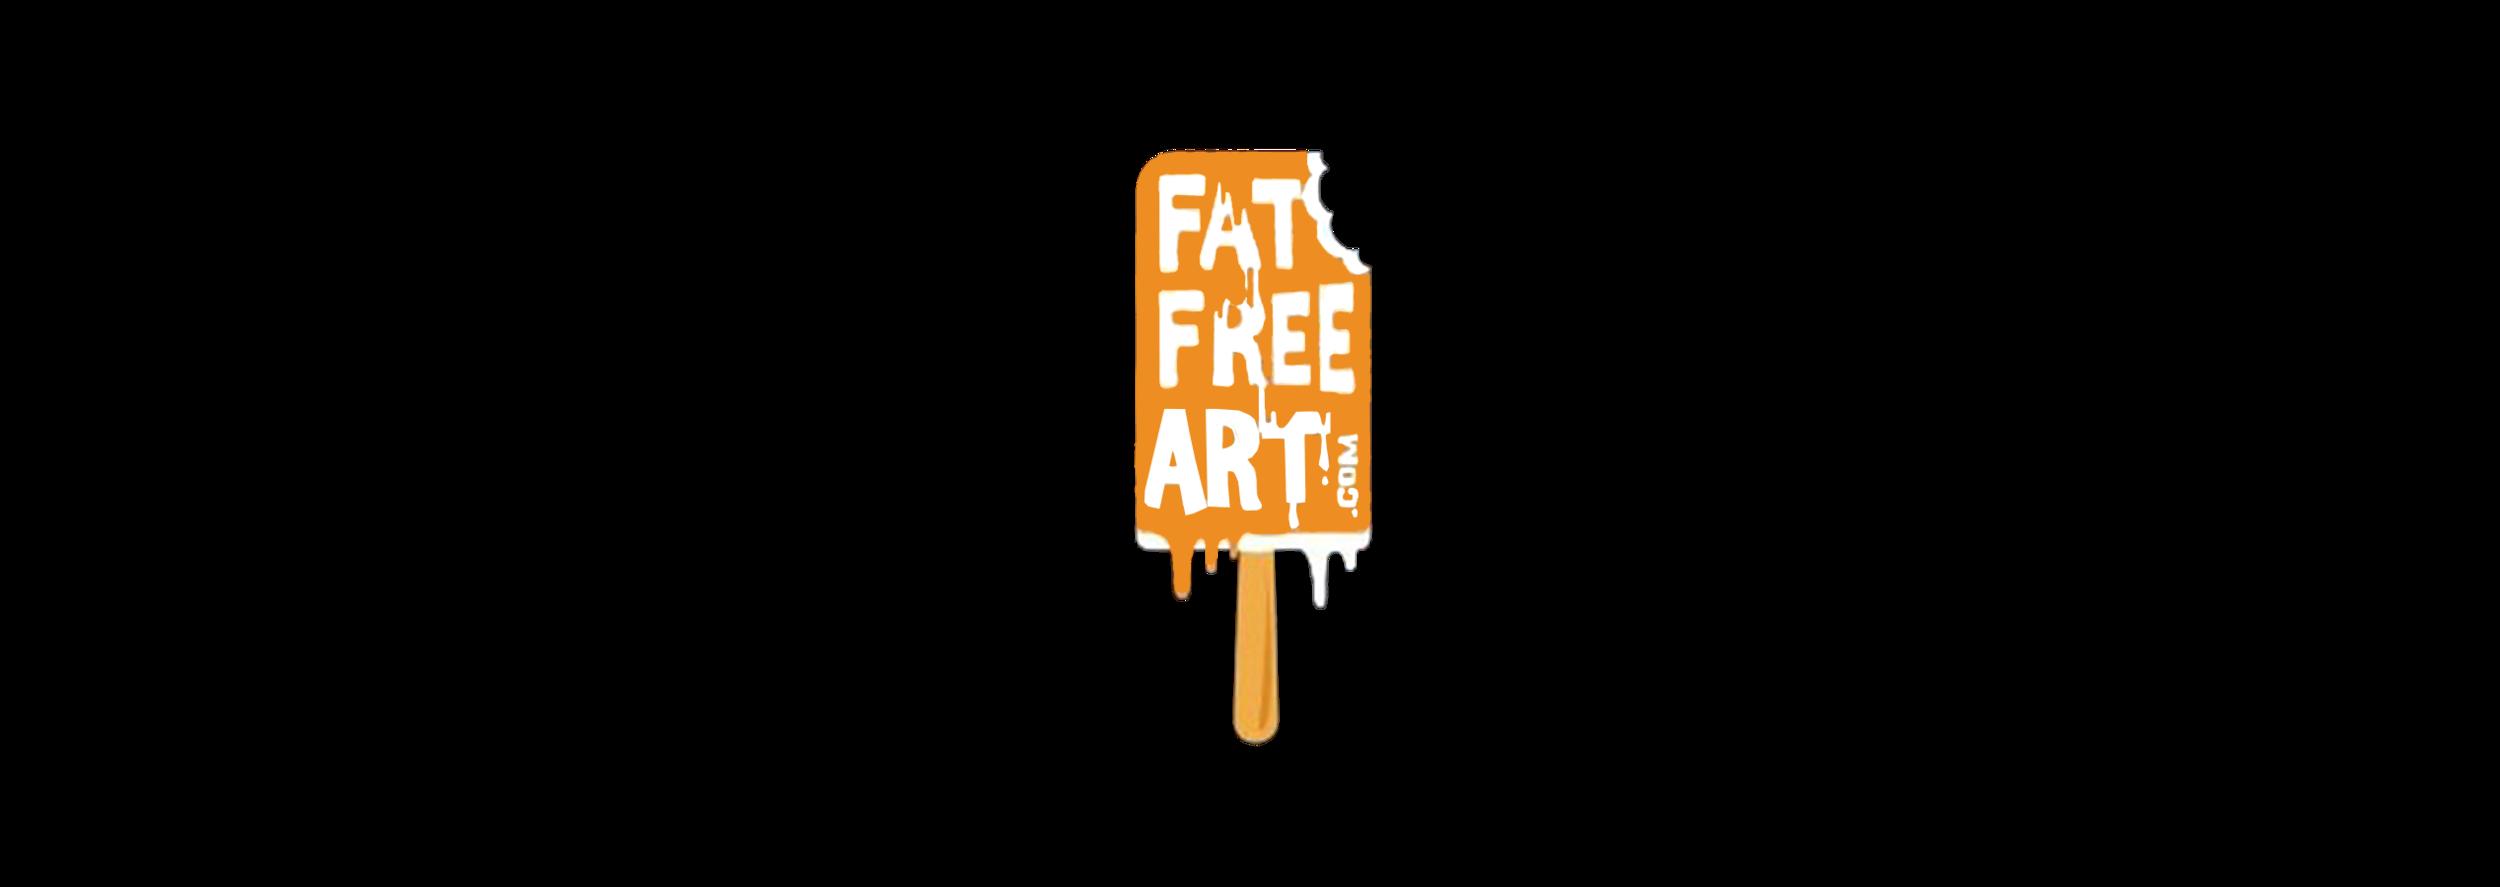 fatfreeartlong.png